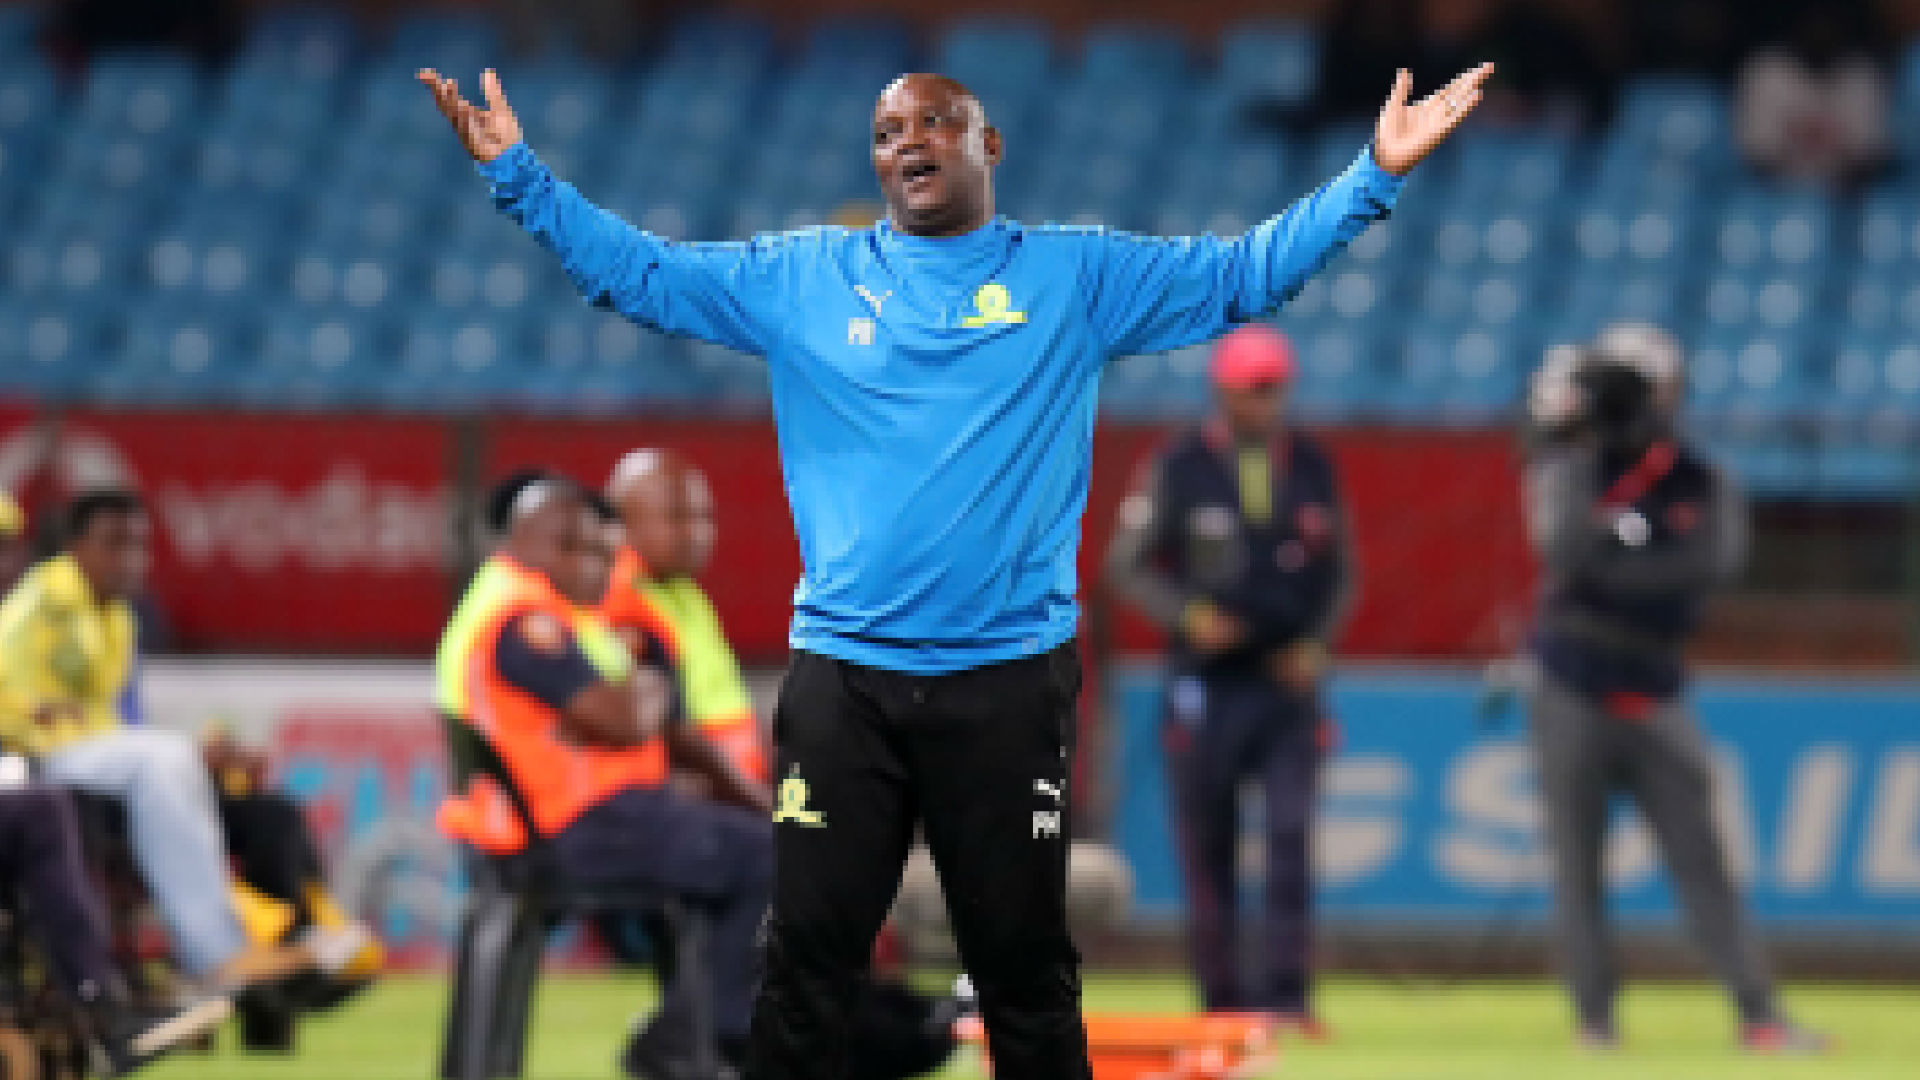 Mamelodi Sundowns v SuperSport United: Kick off, TV channel